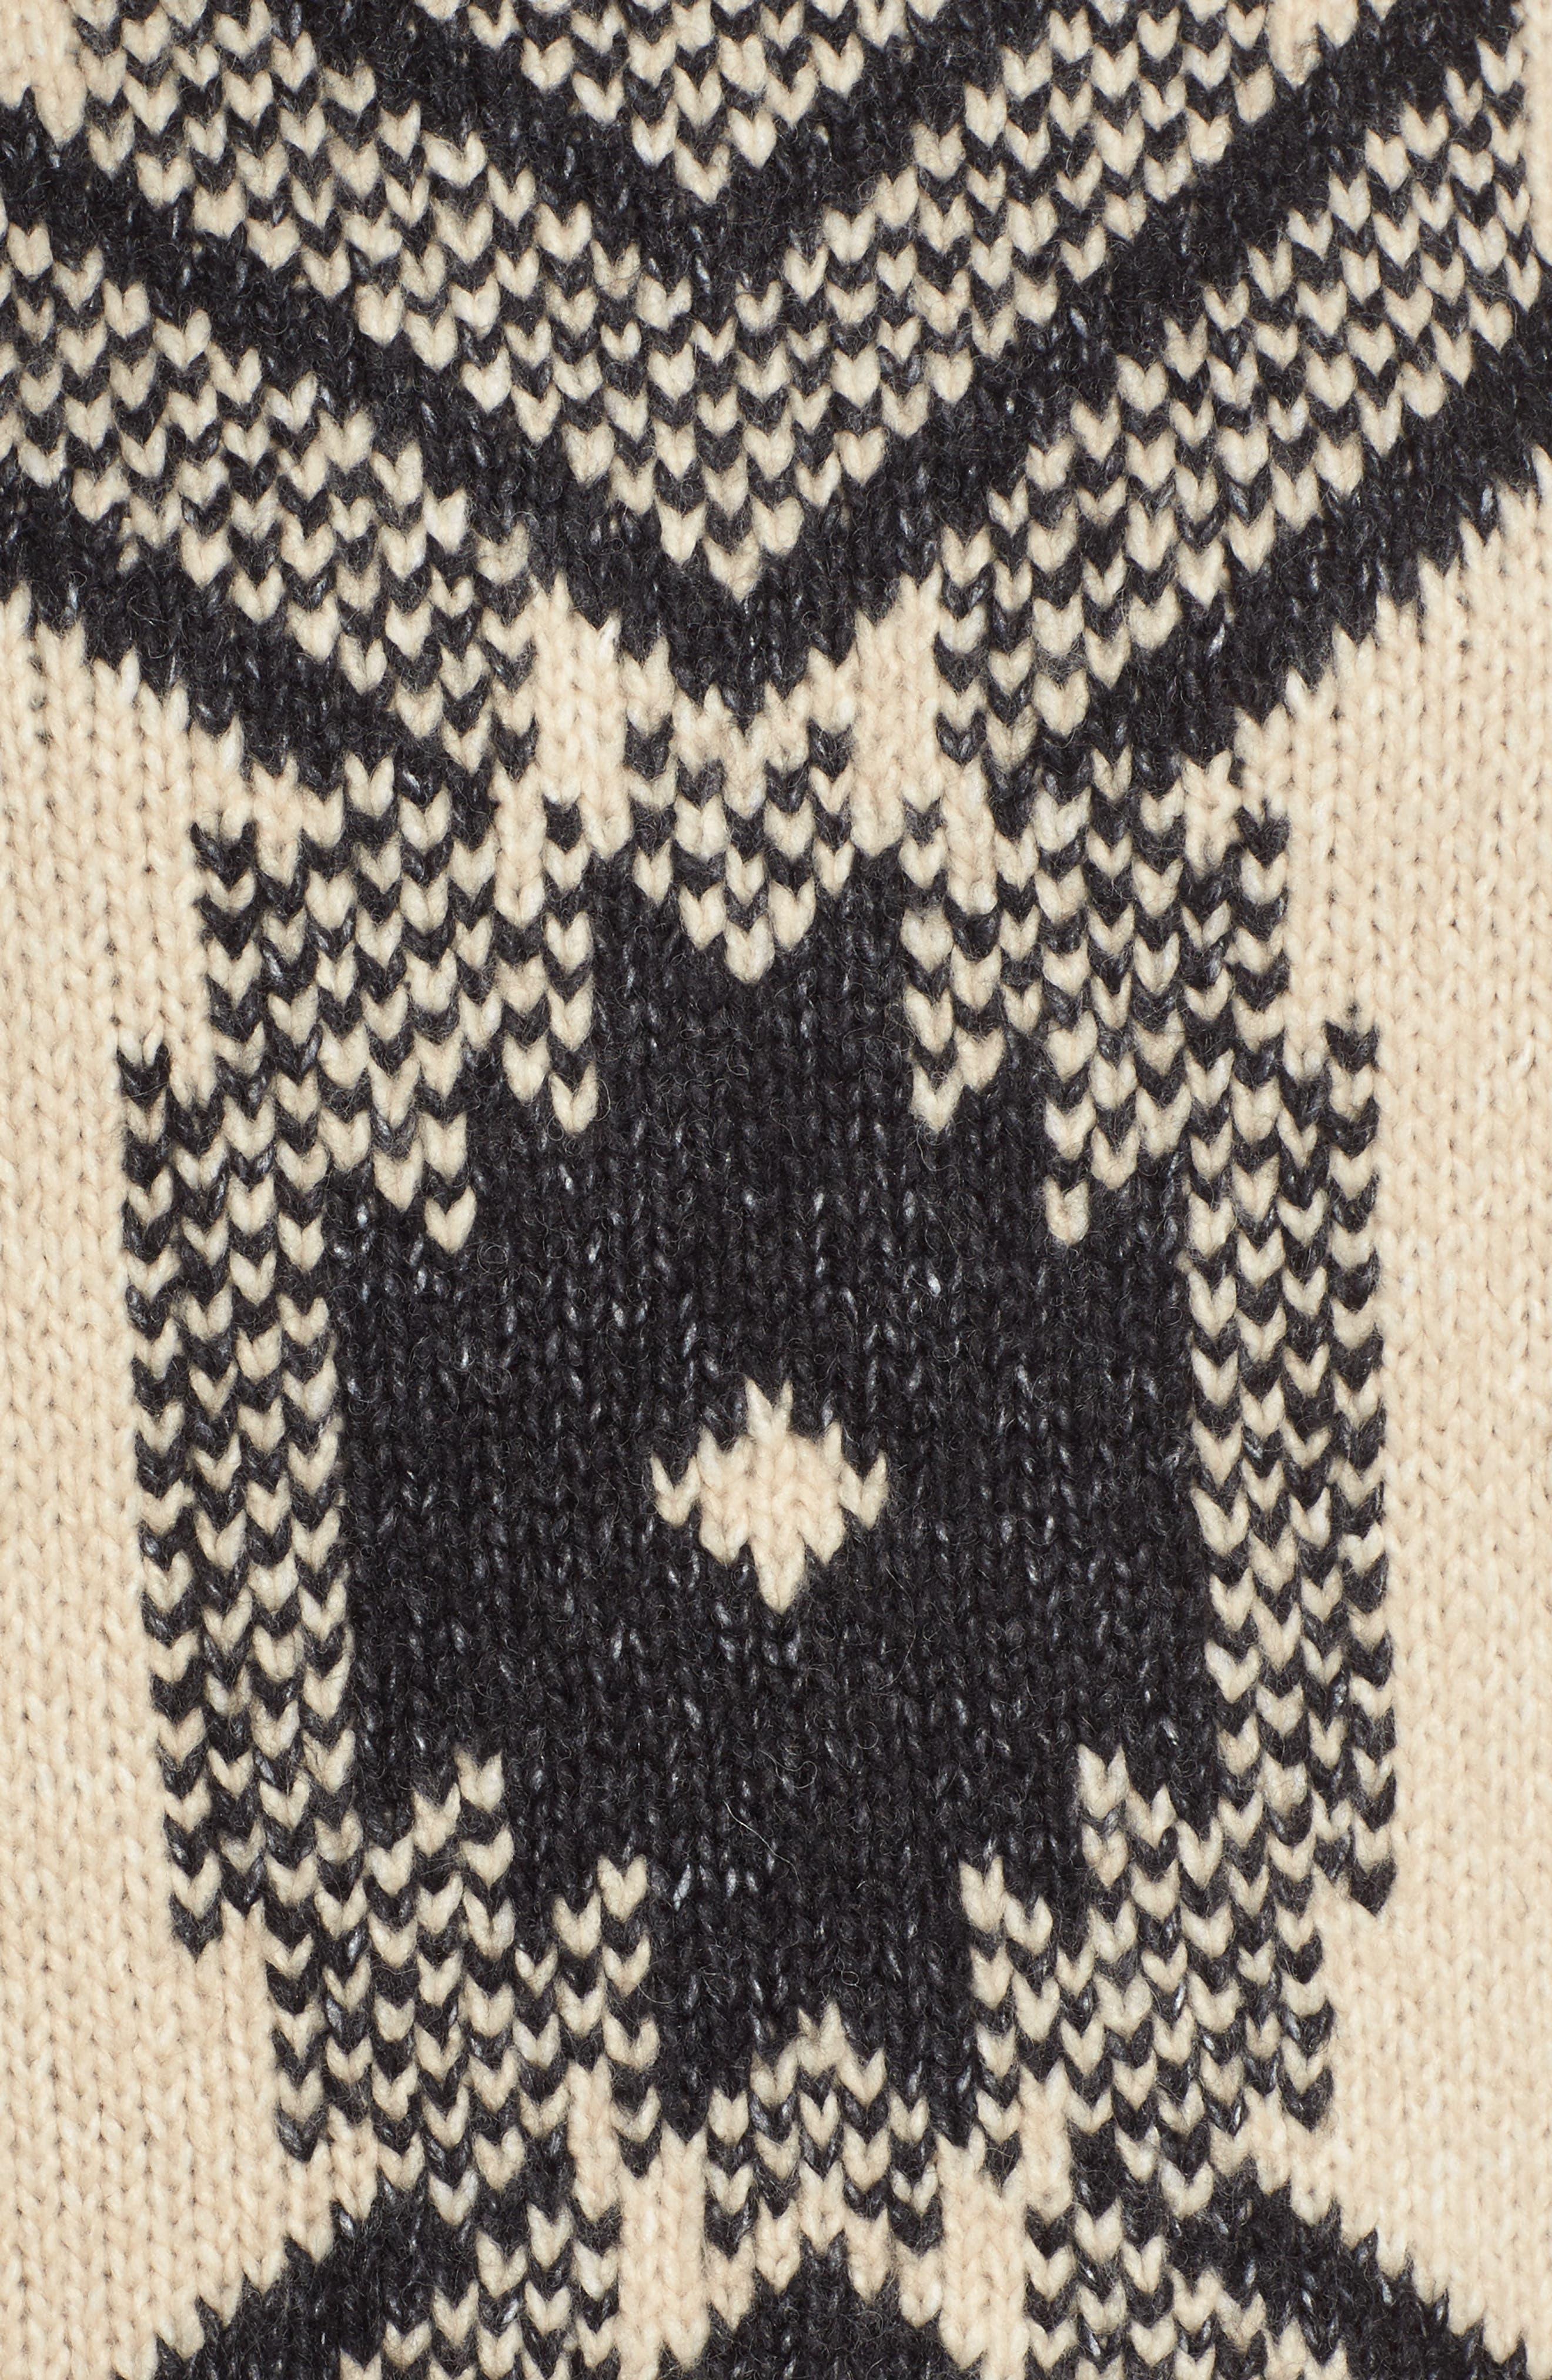 Fringe Sweater,                             Alternate thumbnail 5, color,                             Husked Tan